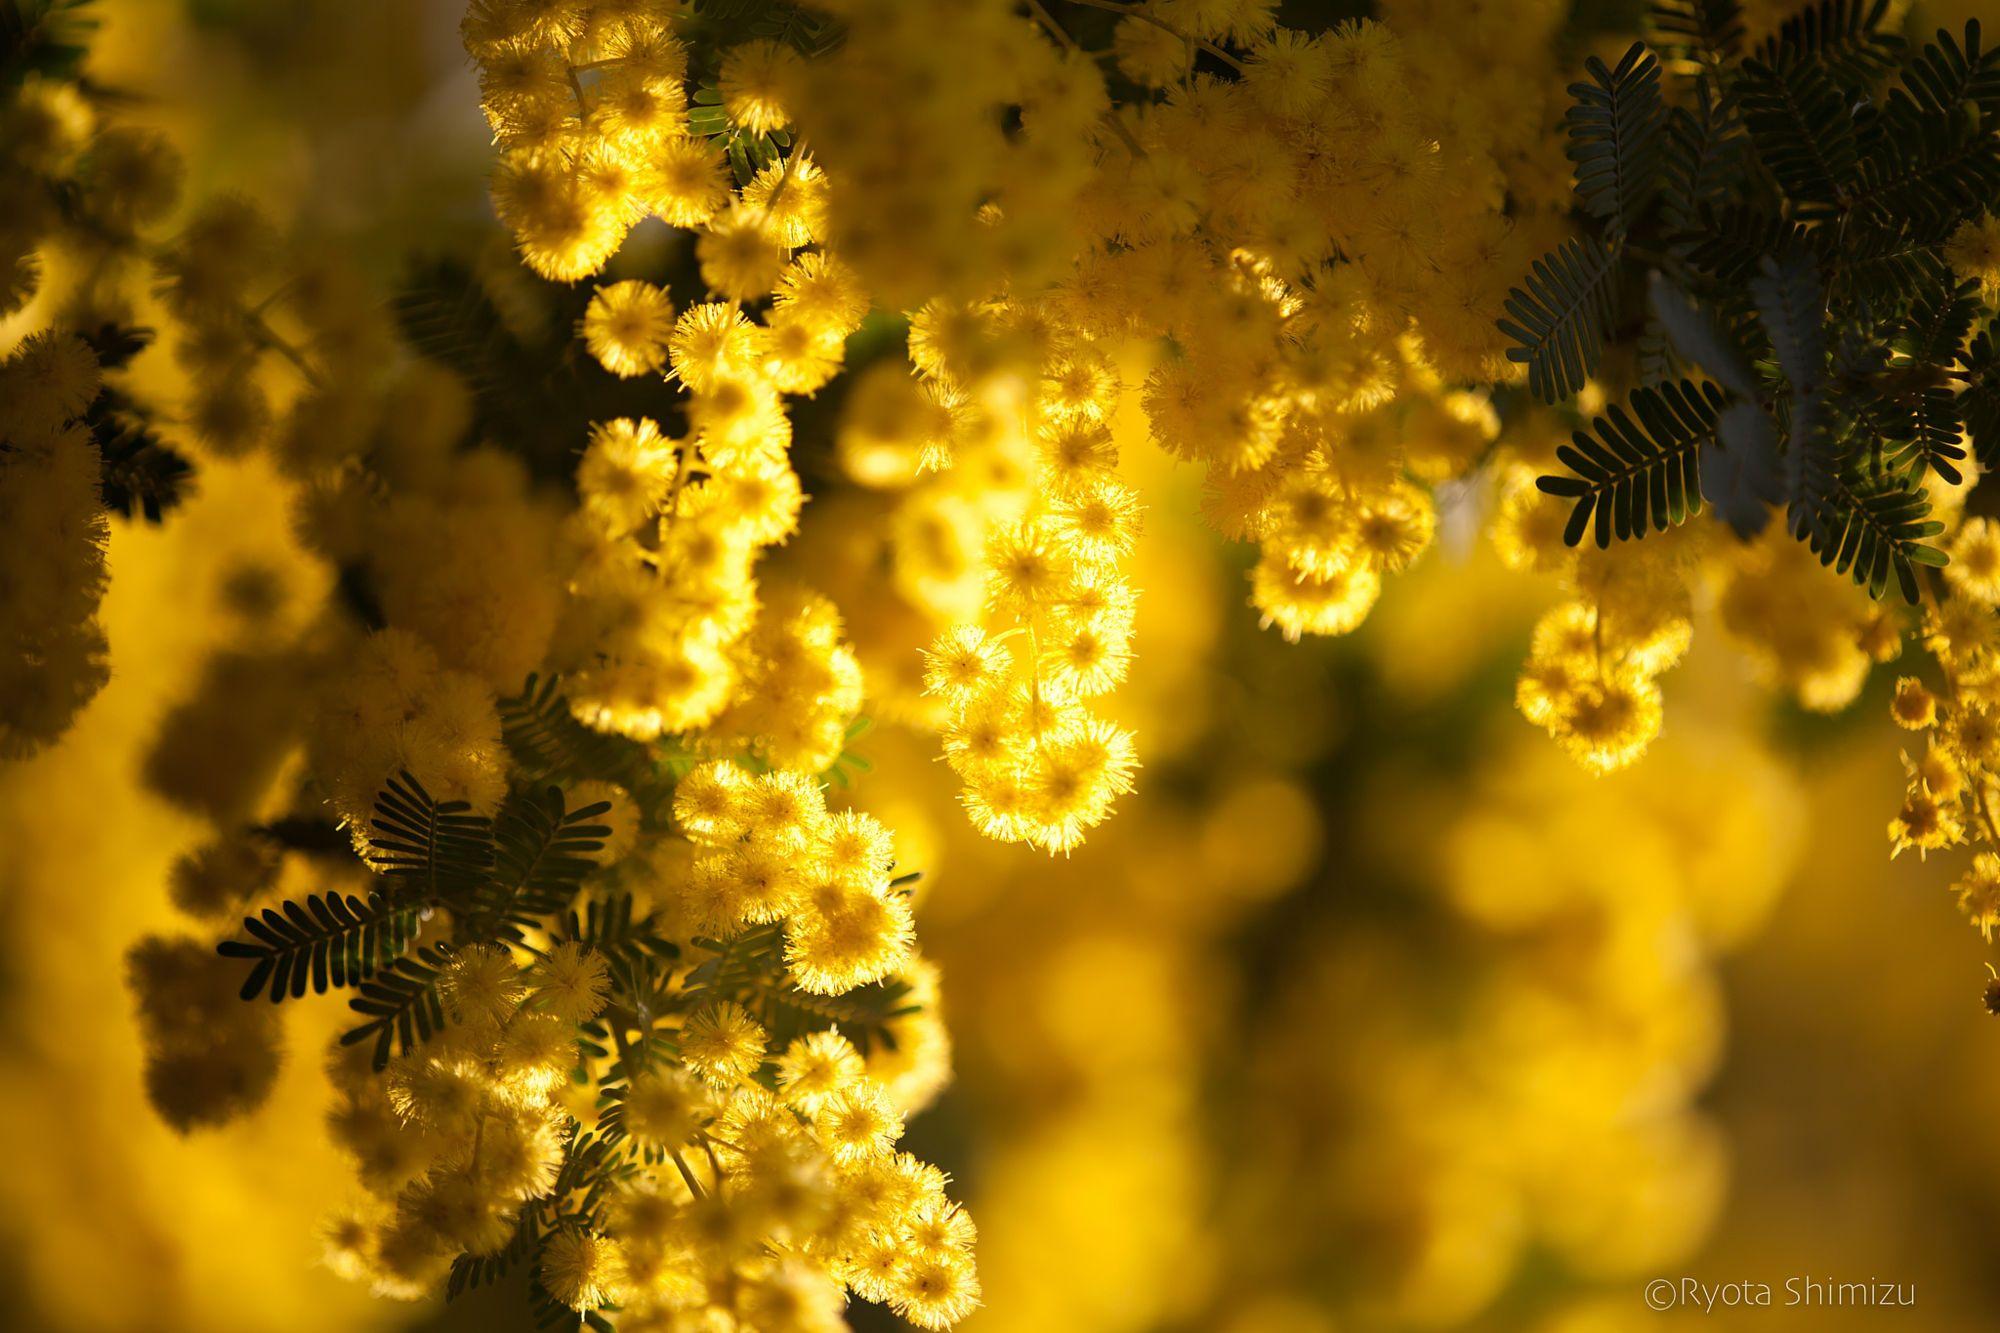 mimosa by Ryota Shimizu on 500px